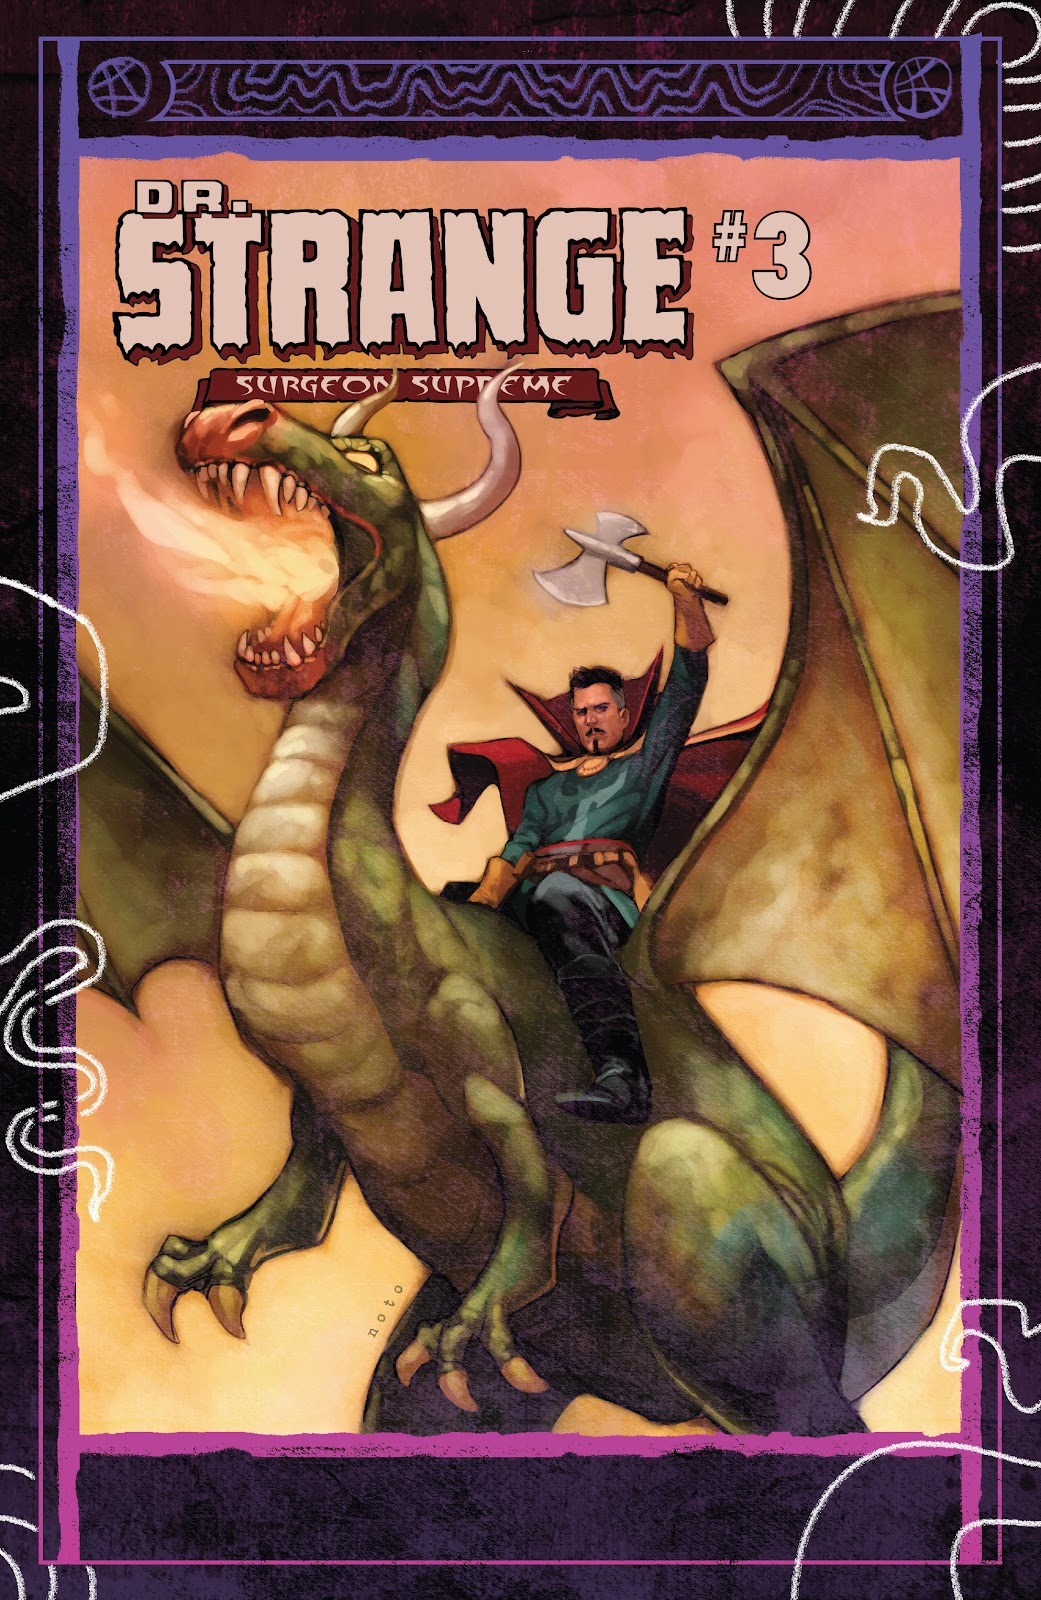 Read online Dr. Strange comic -  Issue #2 - 31